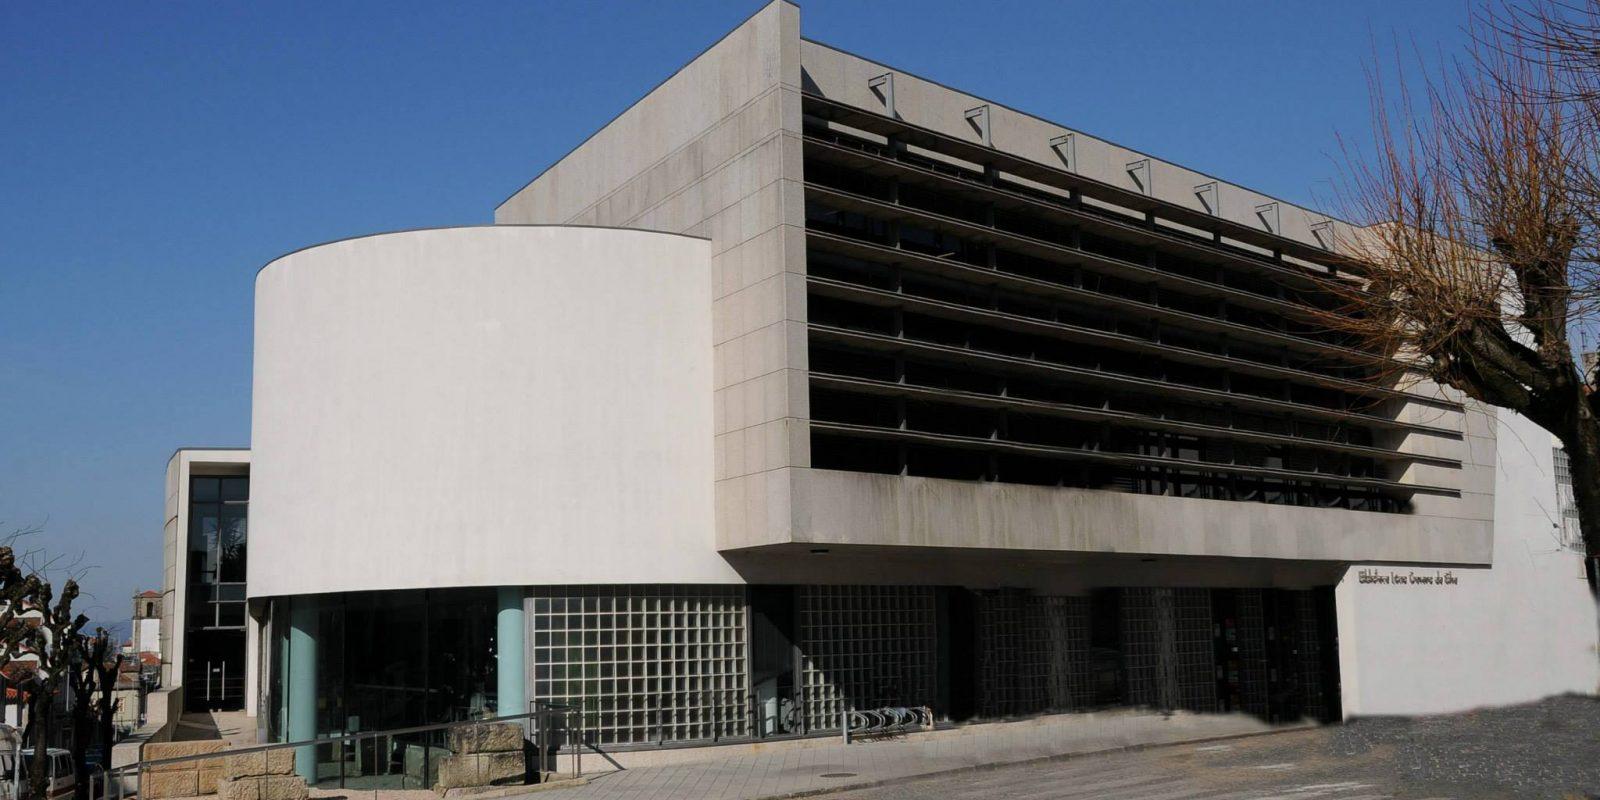 Biblioteca Lucio Craveiro da Silva